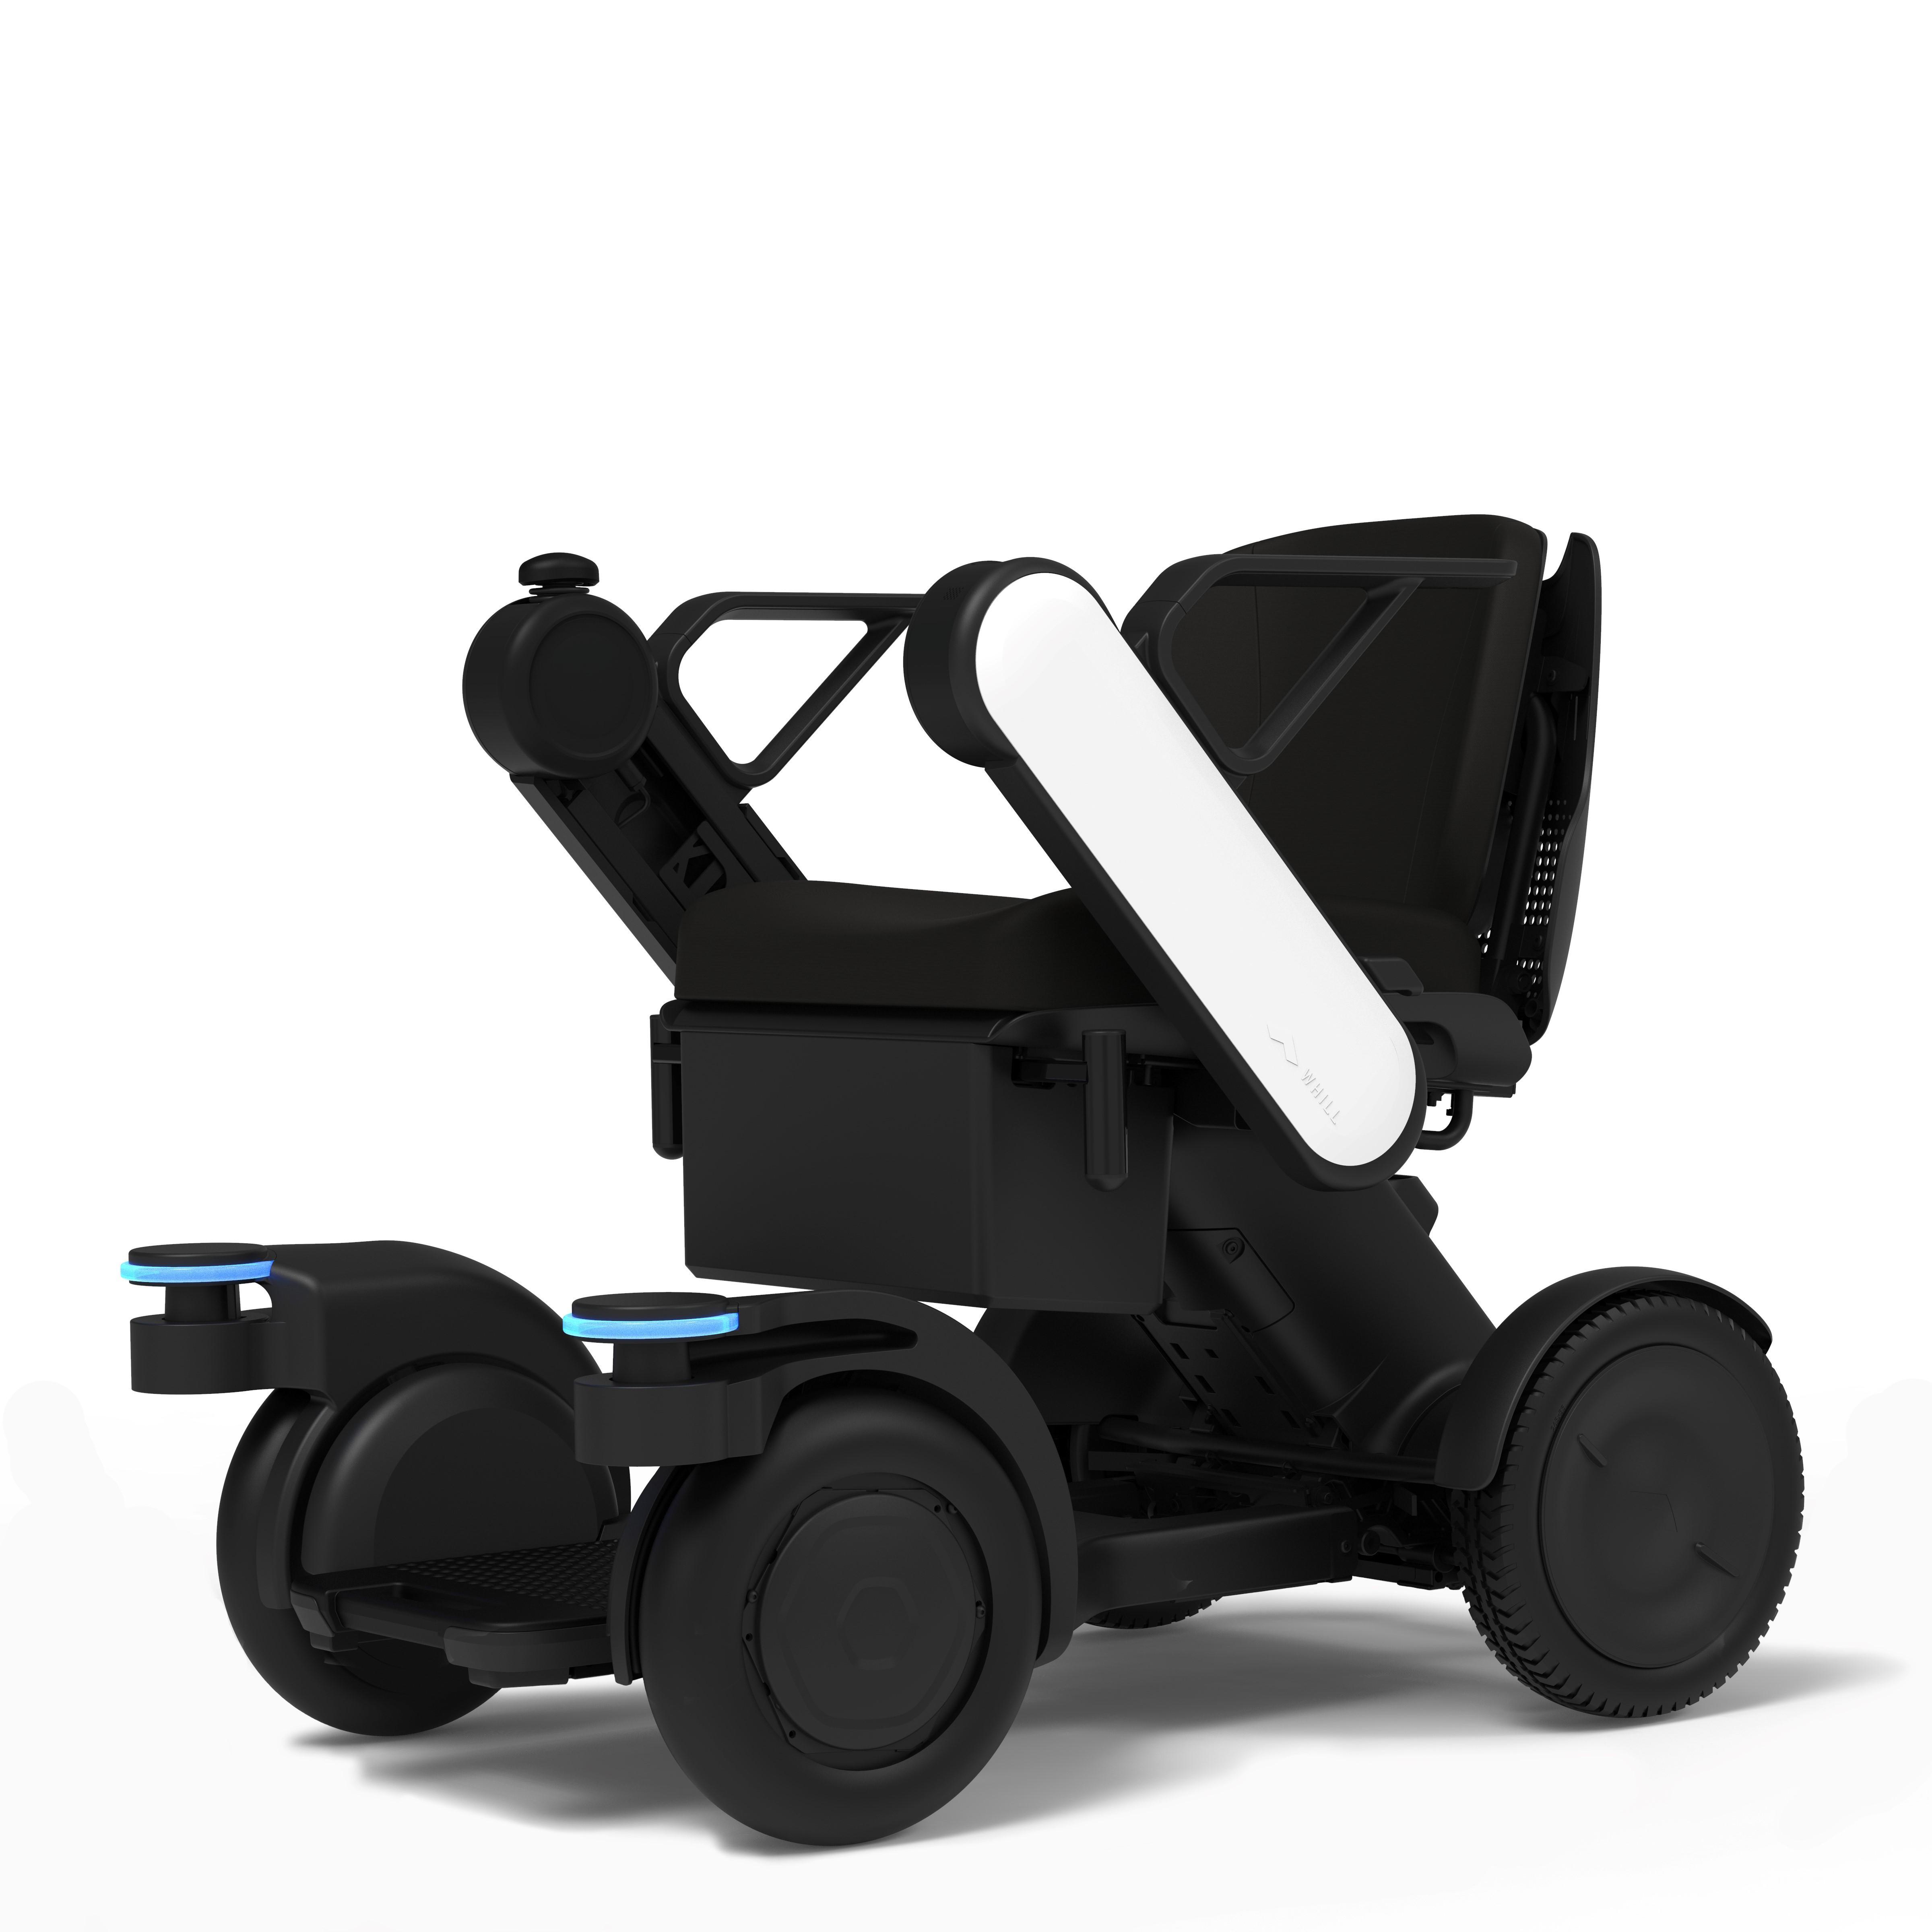 Photo: Robotic mobility